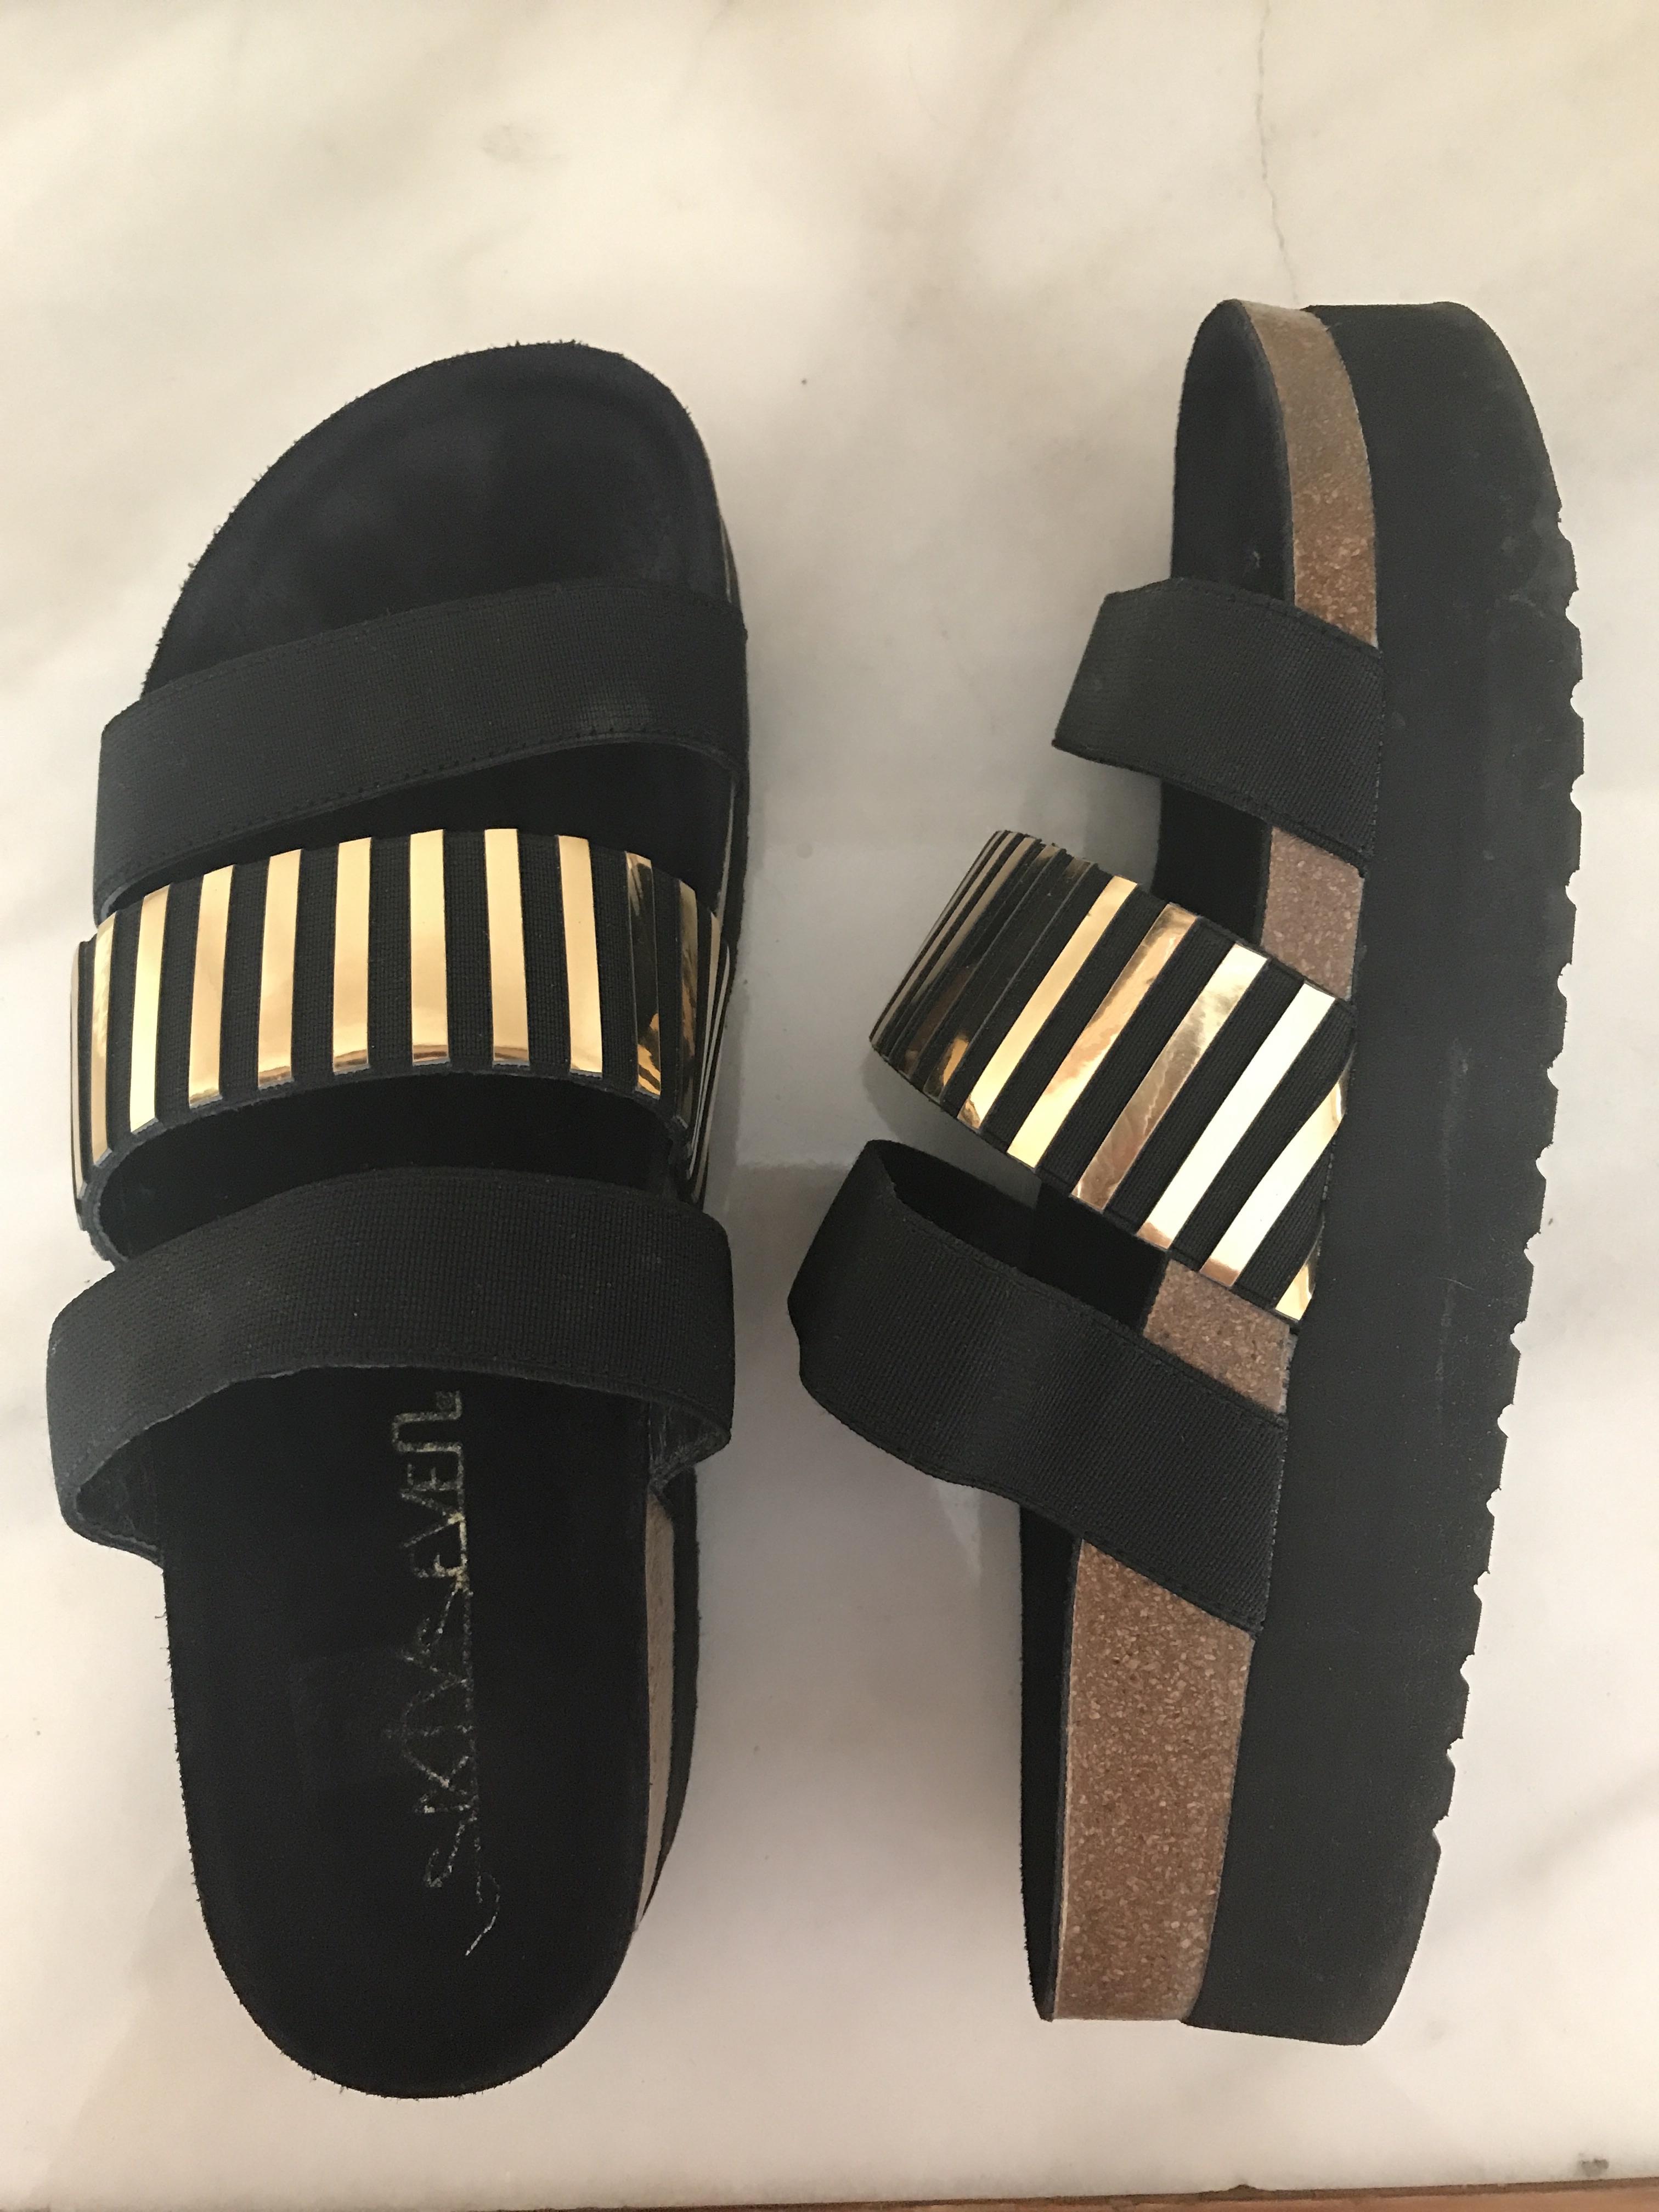 For SummerCris Blog Ortiz Ortiz SummerCris Shoes For Shoes For Blog Shoes 0wPknO